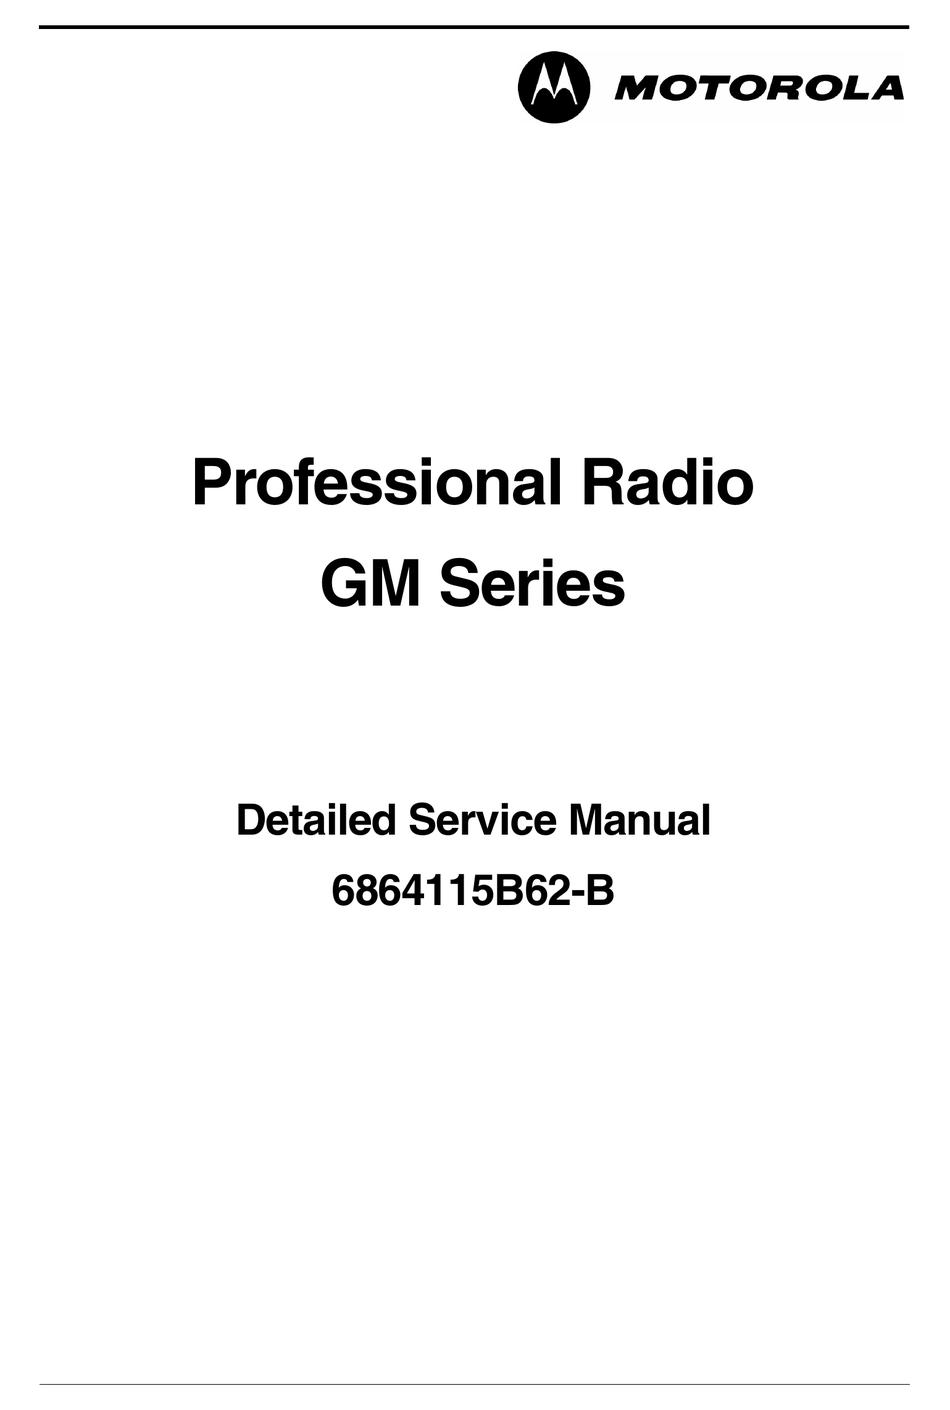 MOTOROLA GM SERIES SERVICE MANUAL Pdf Download | ManualsLib